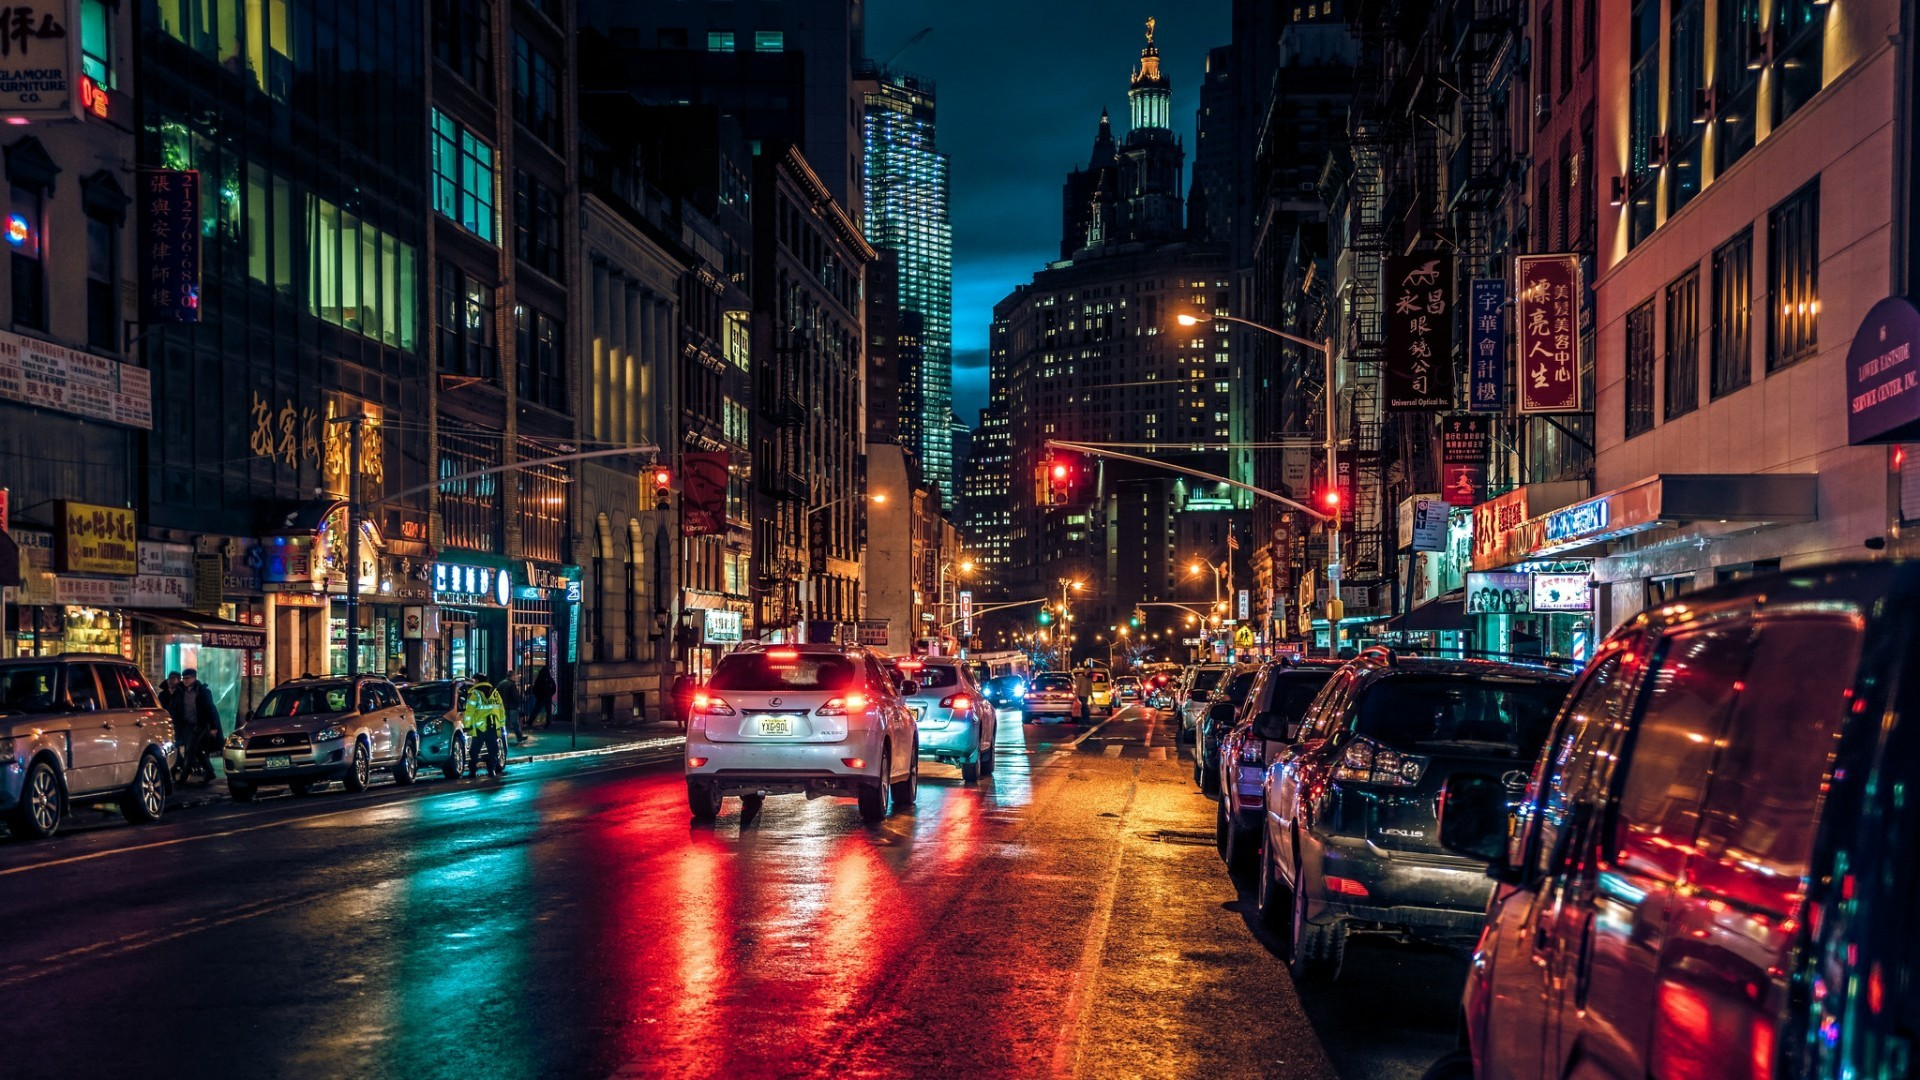 New York City Street Wallpaper (66+ images)